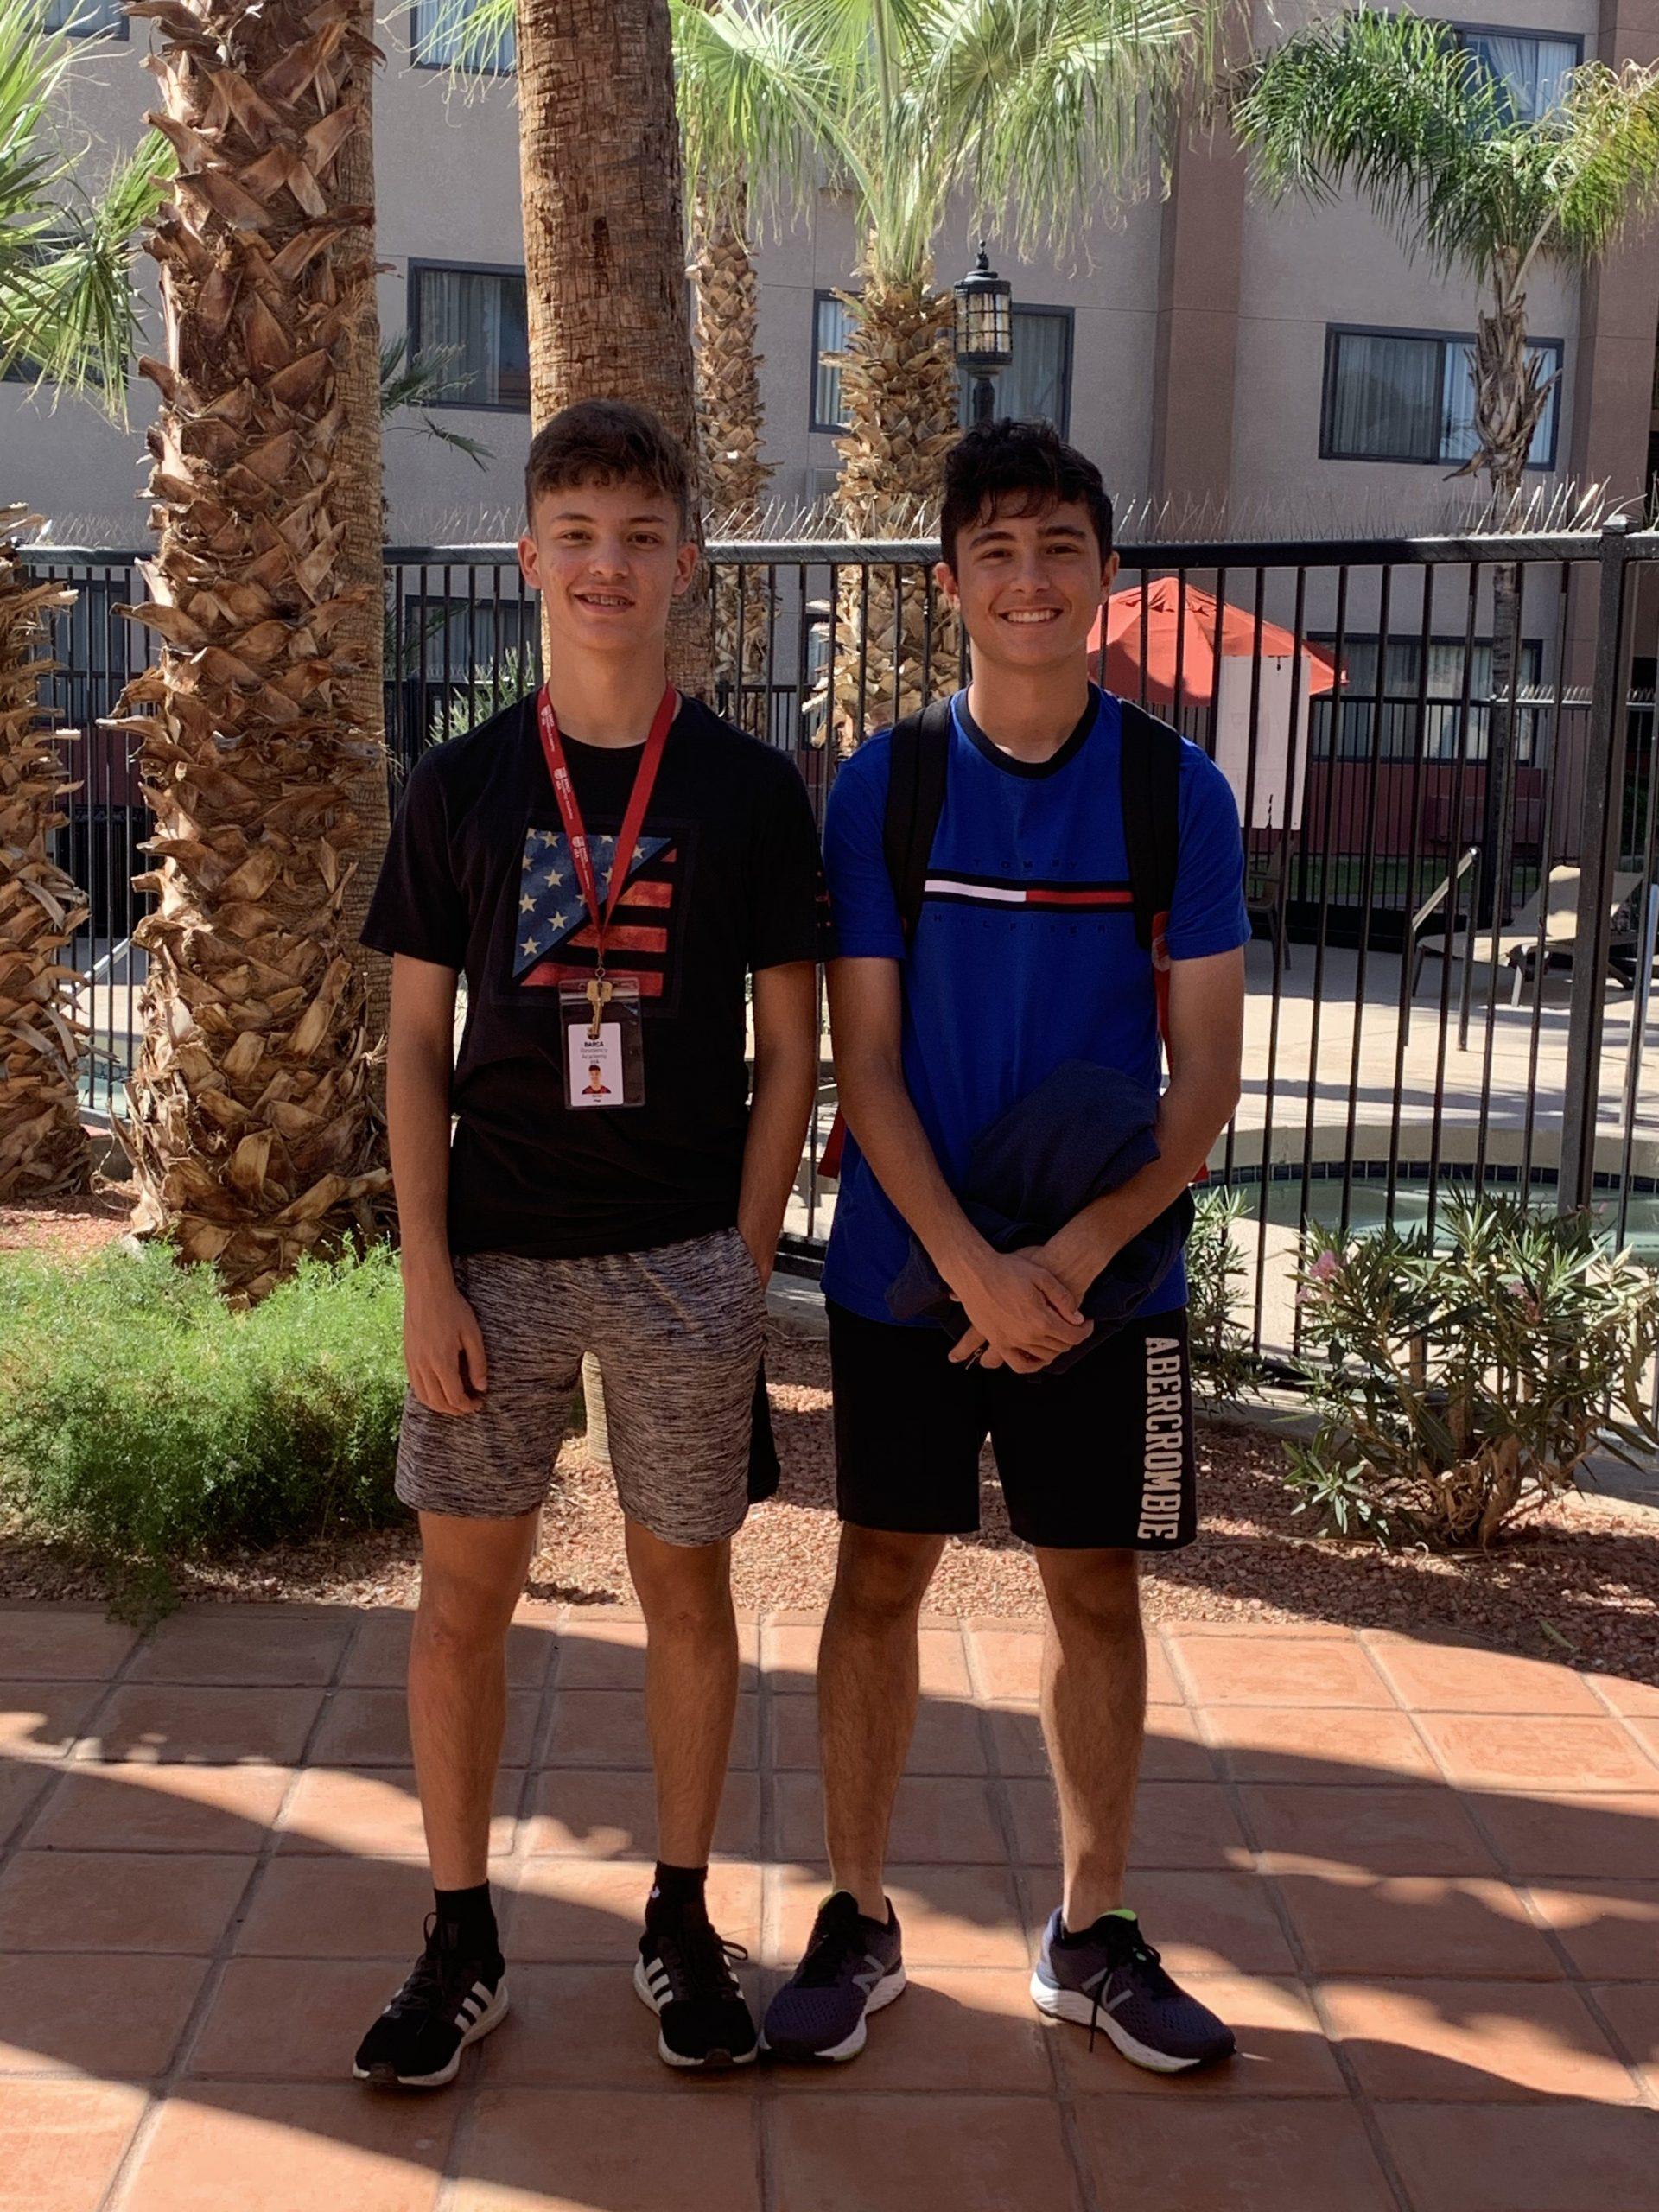 Interview of the Week - Adrien and Julien Pilet - Blog - Middle School